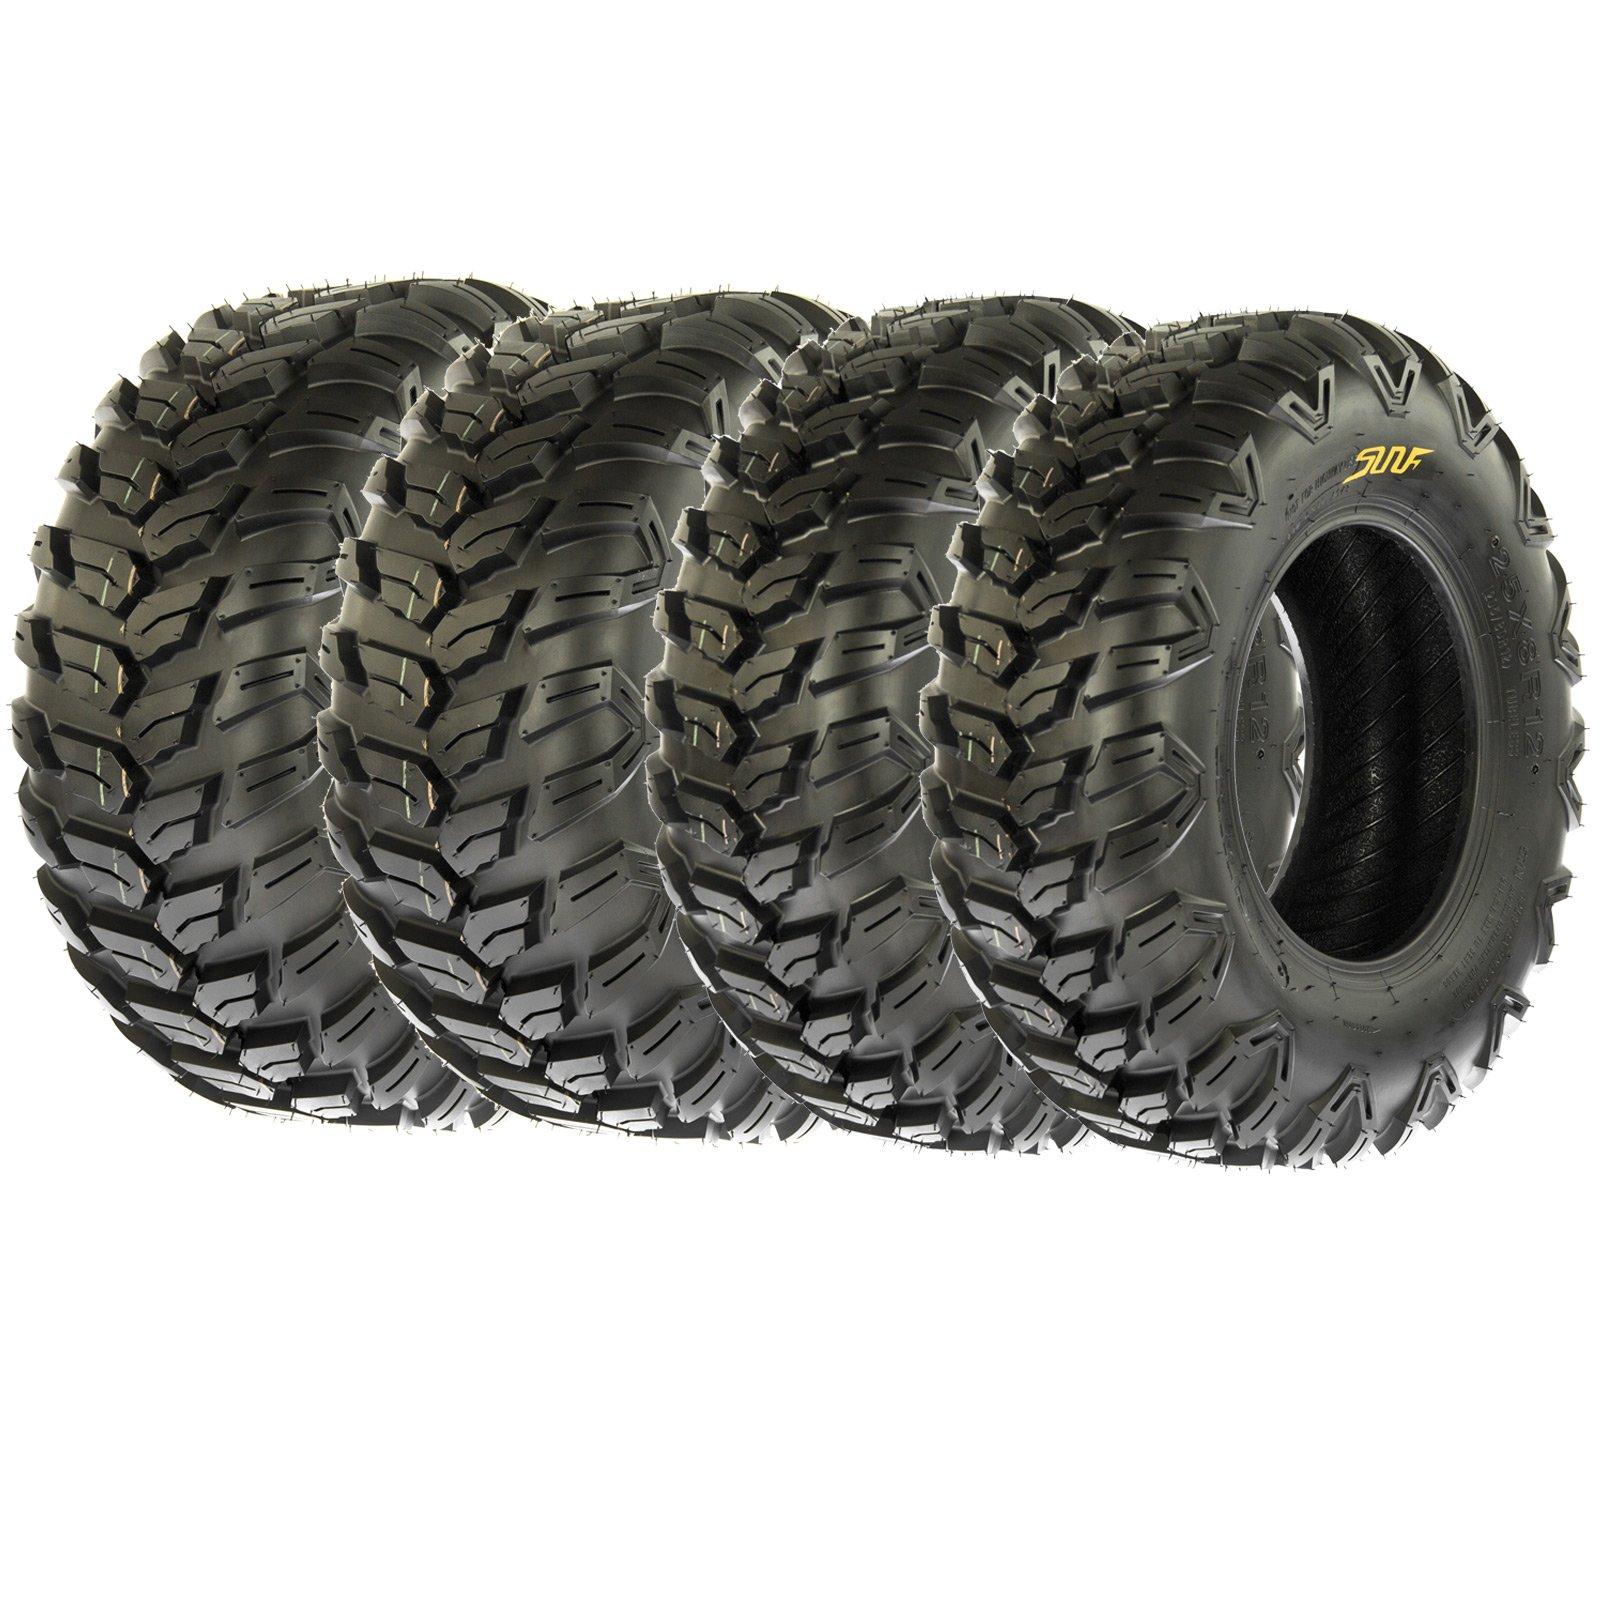 SunF Radial A/T Sport ATV UTV Tires 26x9R-14 & 26x11R-14 6 PR A043 (Full set of 4, Front & Rear)